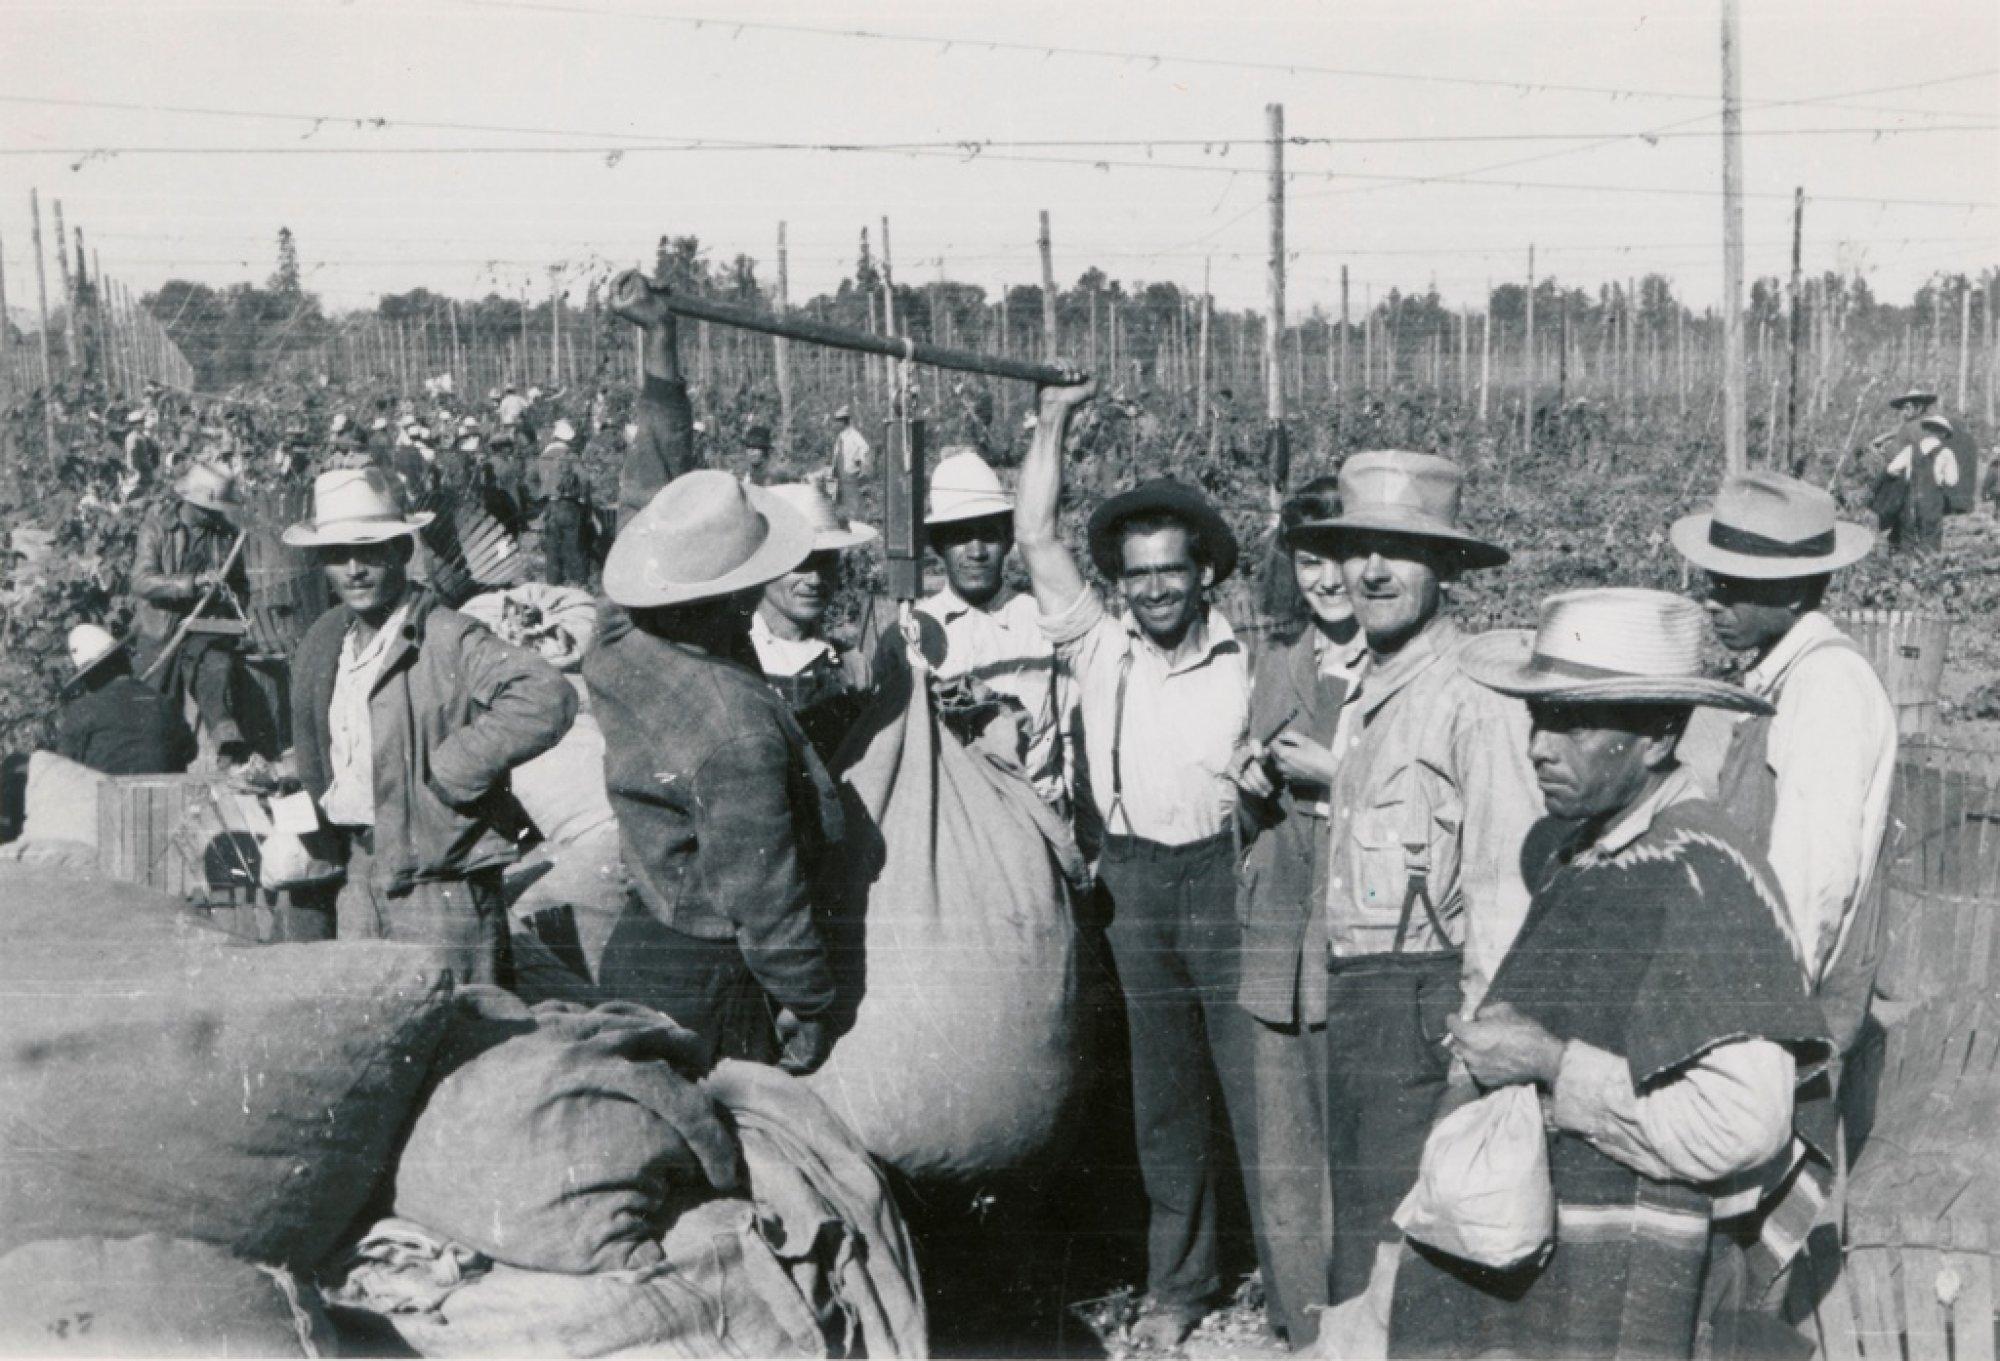 Oregon, 1930s